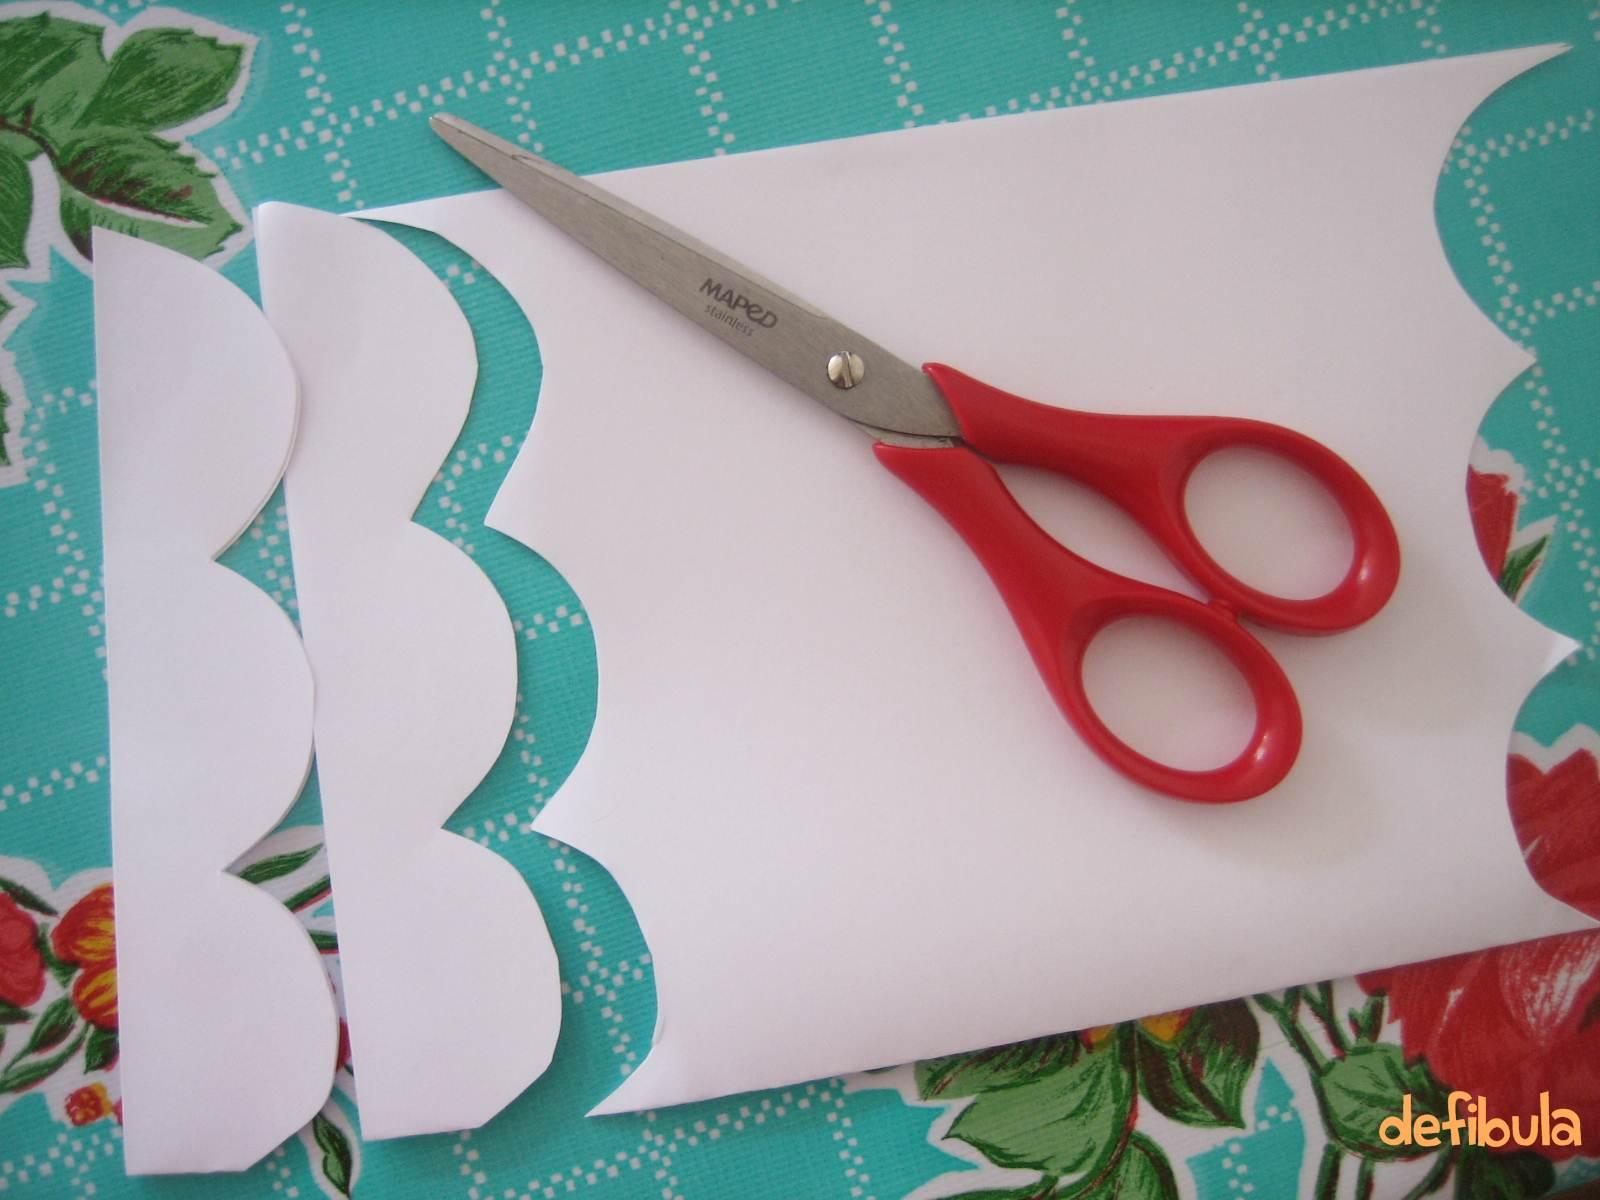 Def bula cenefas de papel paper border - Cenefas de papel ...